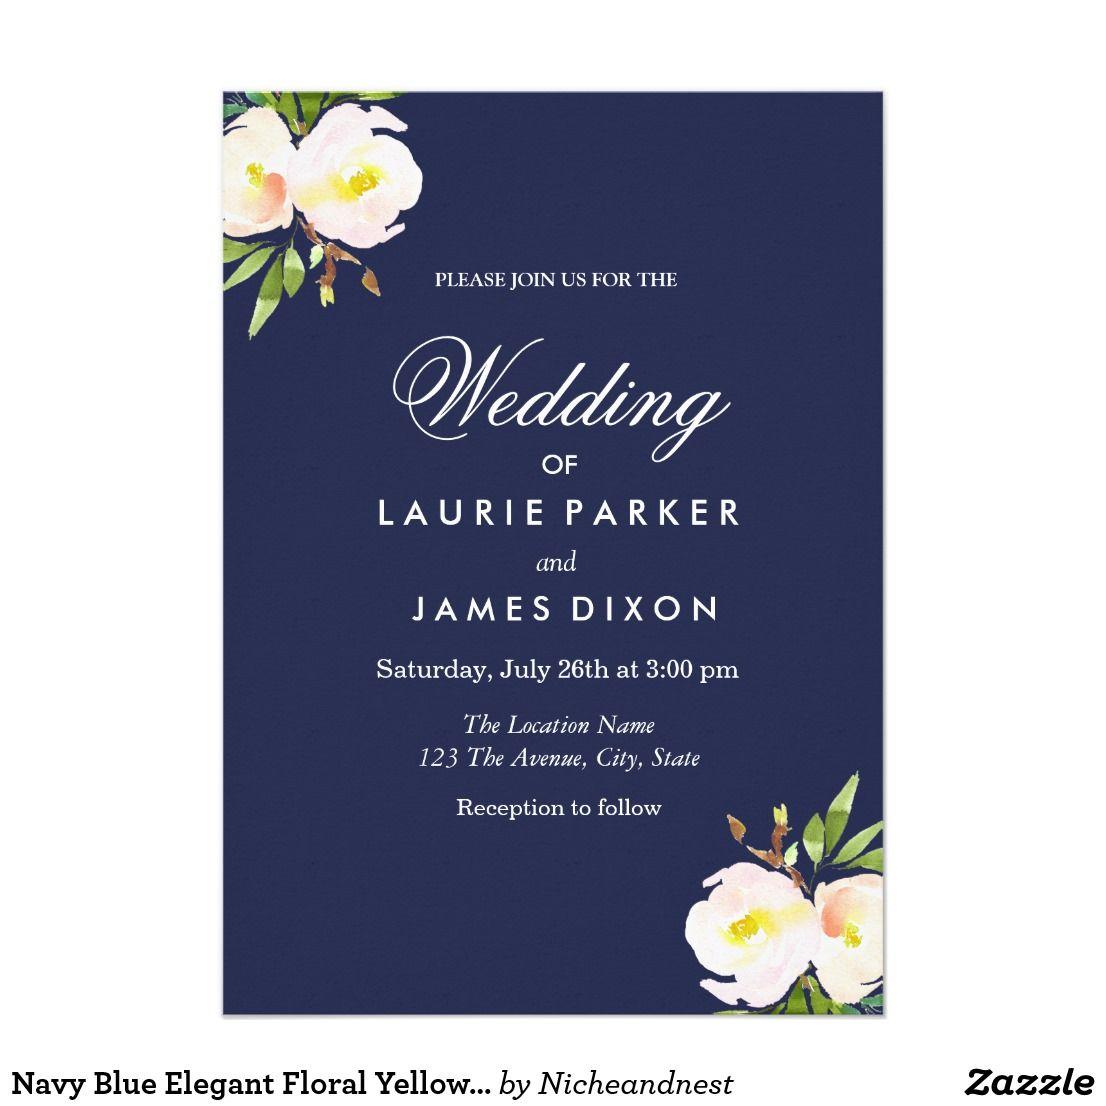 Navy Blue Elegant Floral Yellow Wedding Invitation | Wedding ...